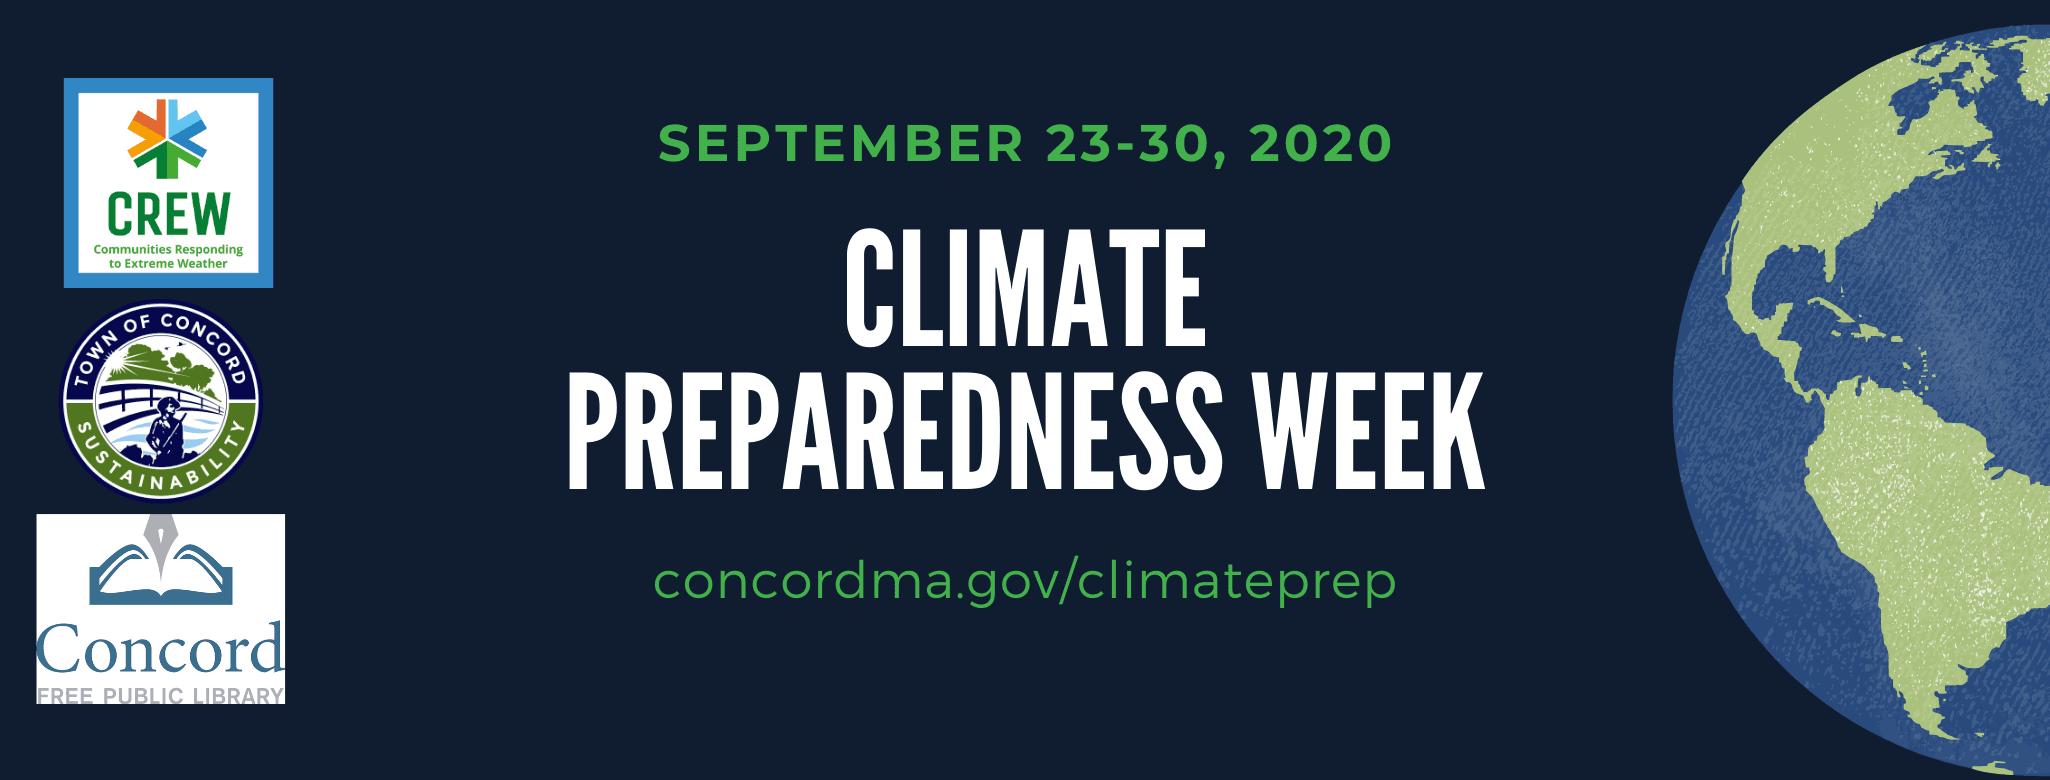 Climate Preparedness Week banner